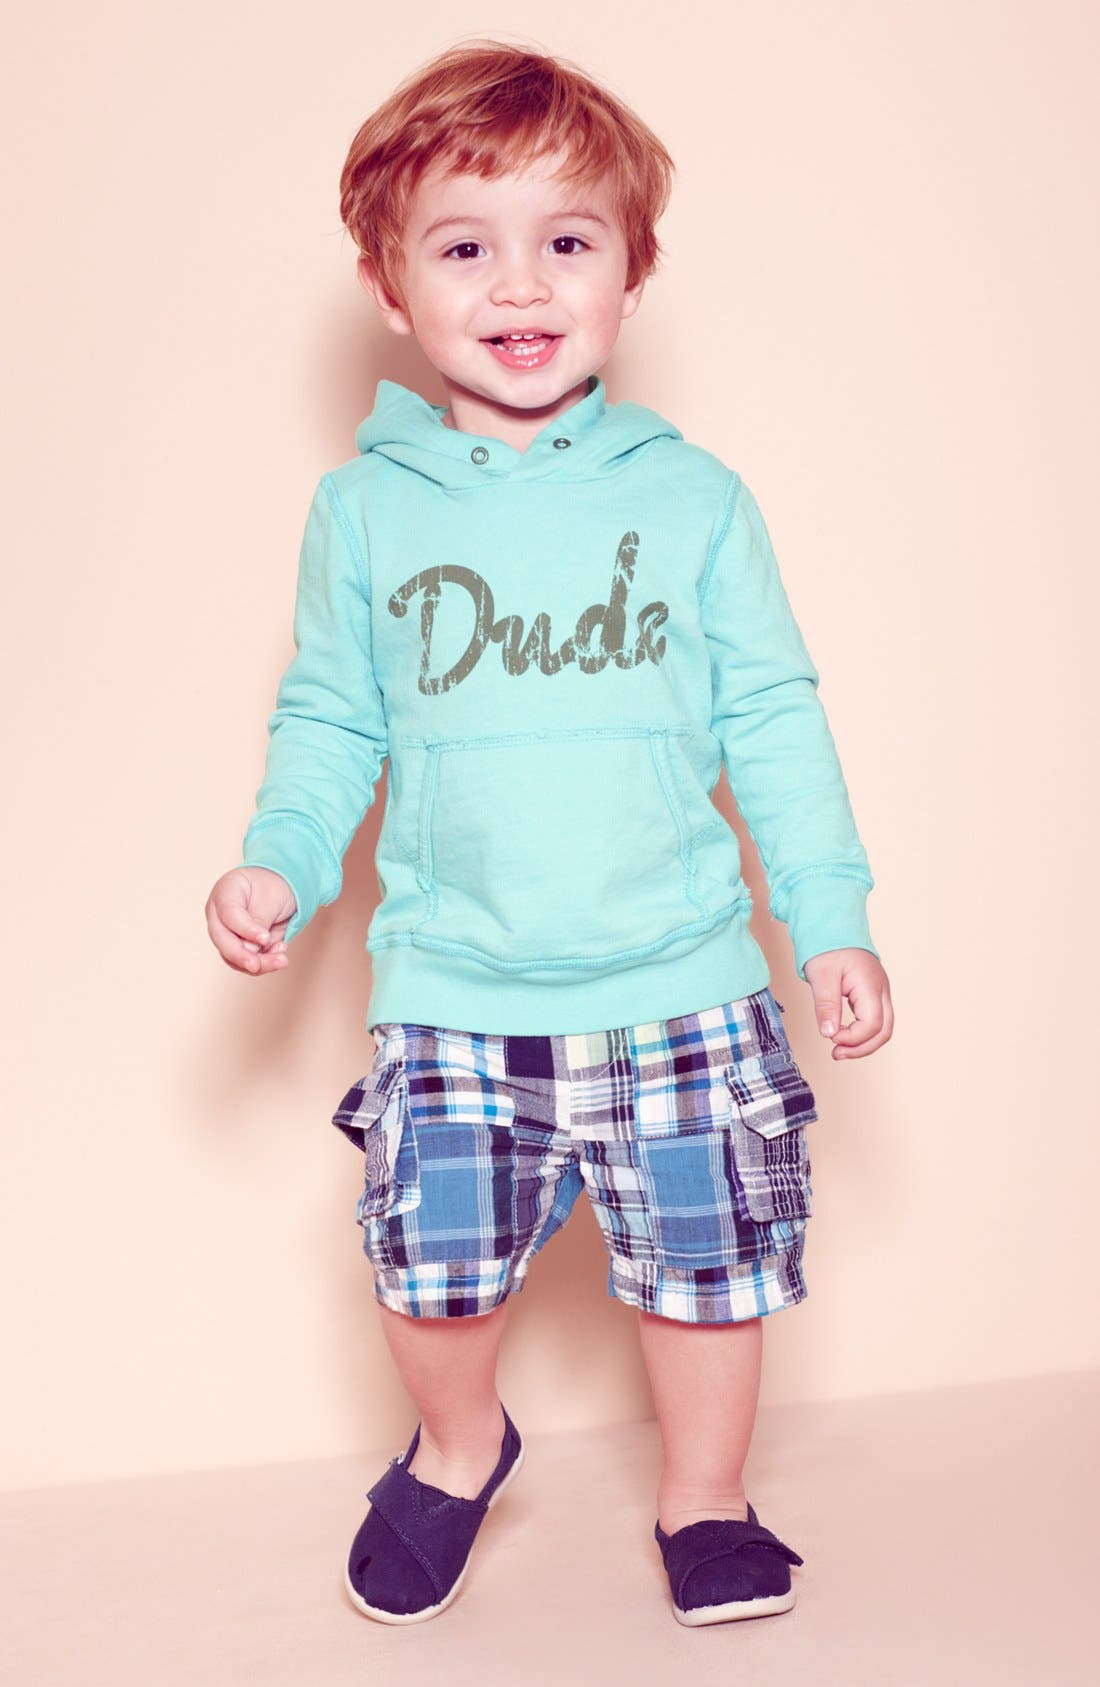 Main Image - Peek Hoodie & Plaid Shorts, Babiators Sunglasses & TOMS Slip-On (Infant)